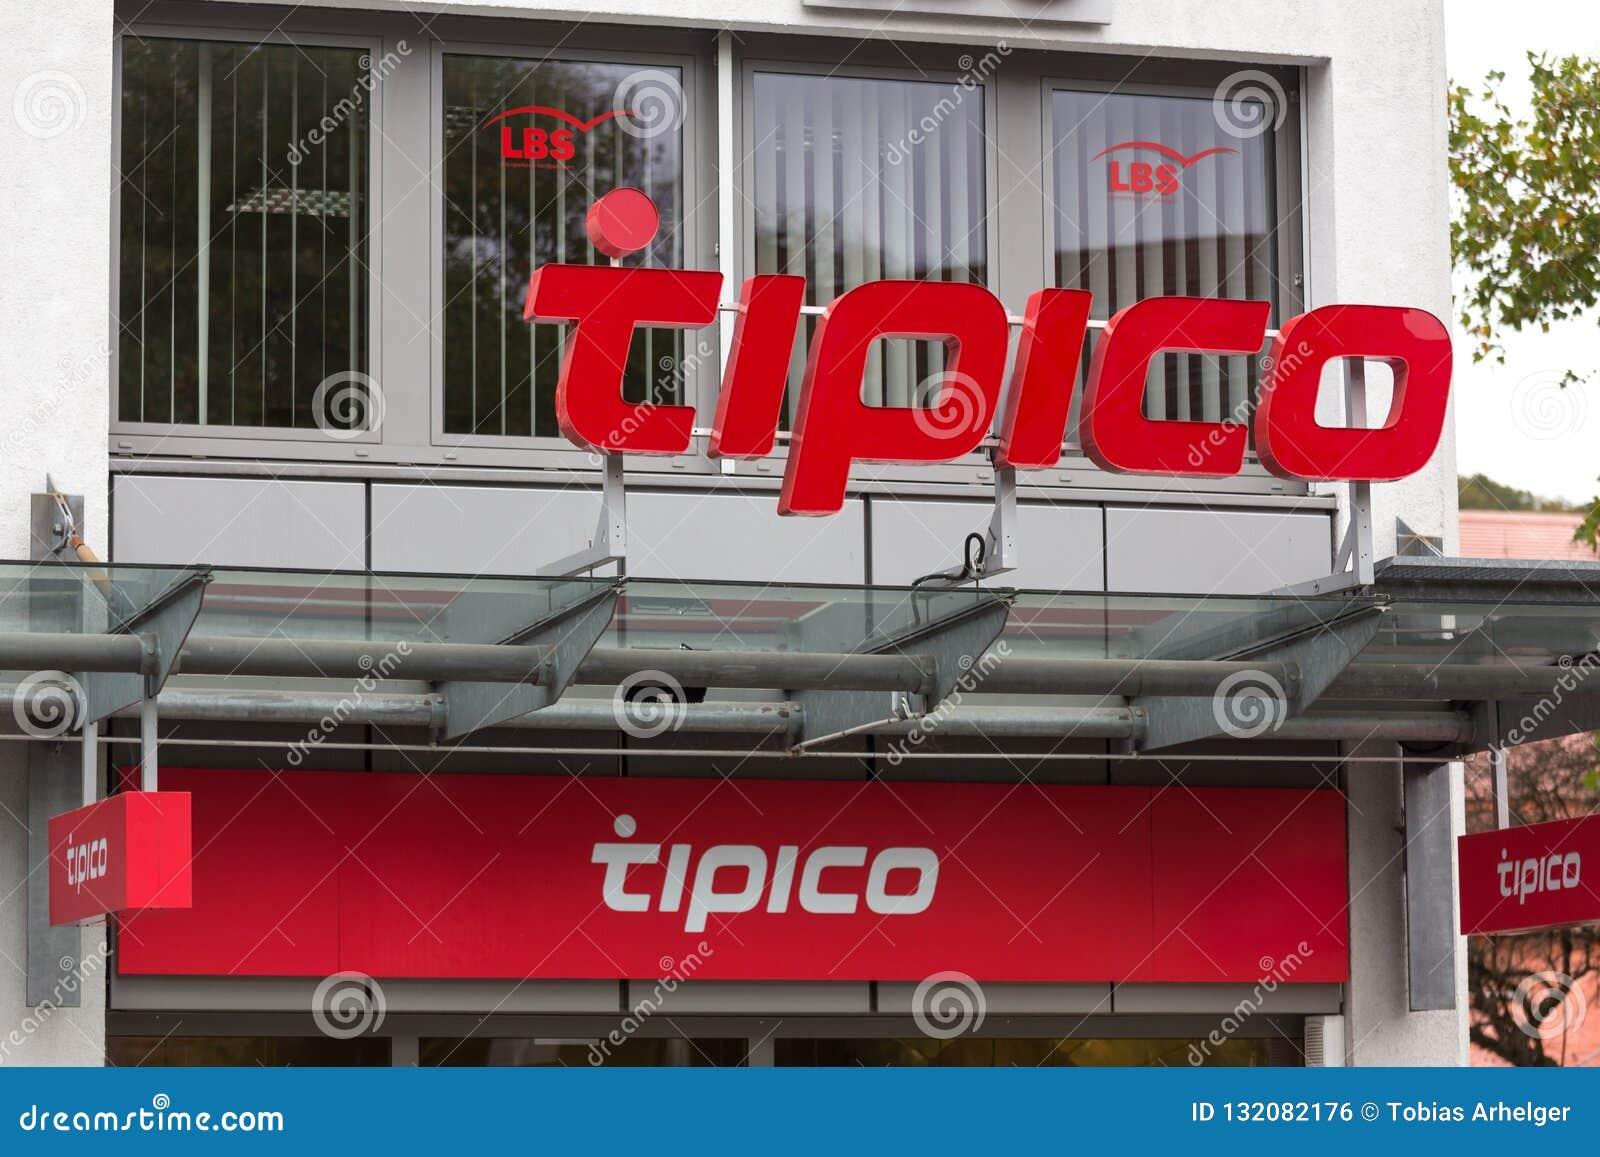 Tipico Siegen